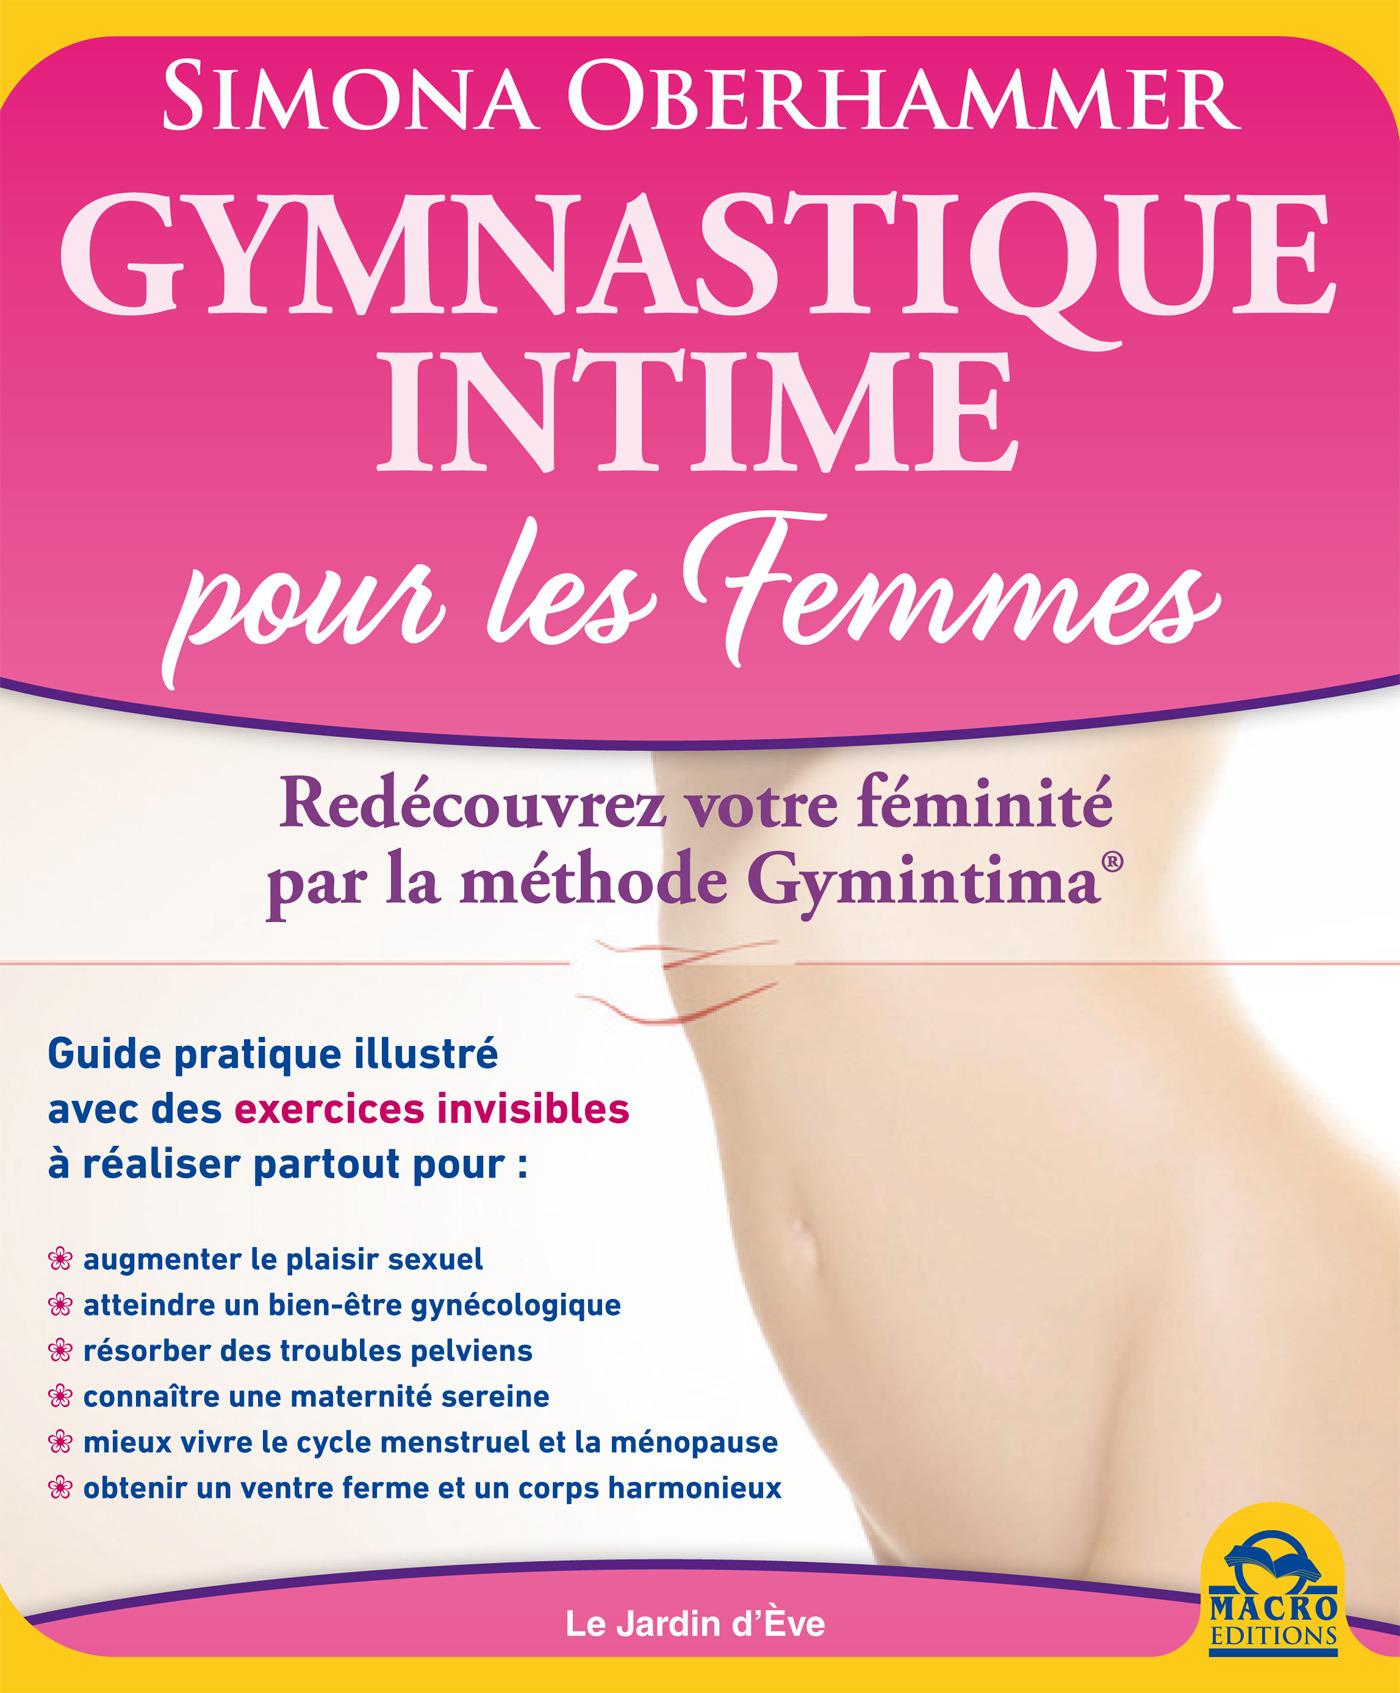 Simona Oberhammer Gymnastique intime pour les Femmes